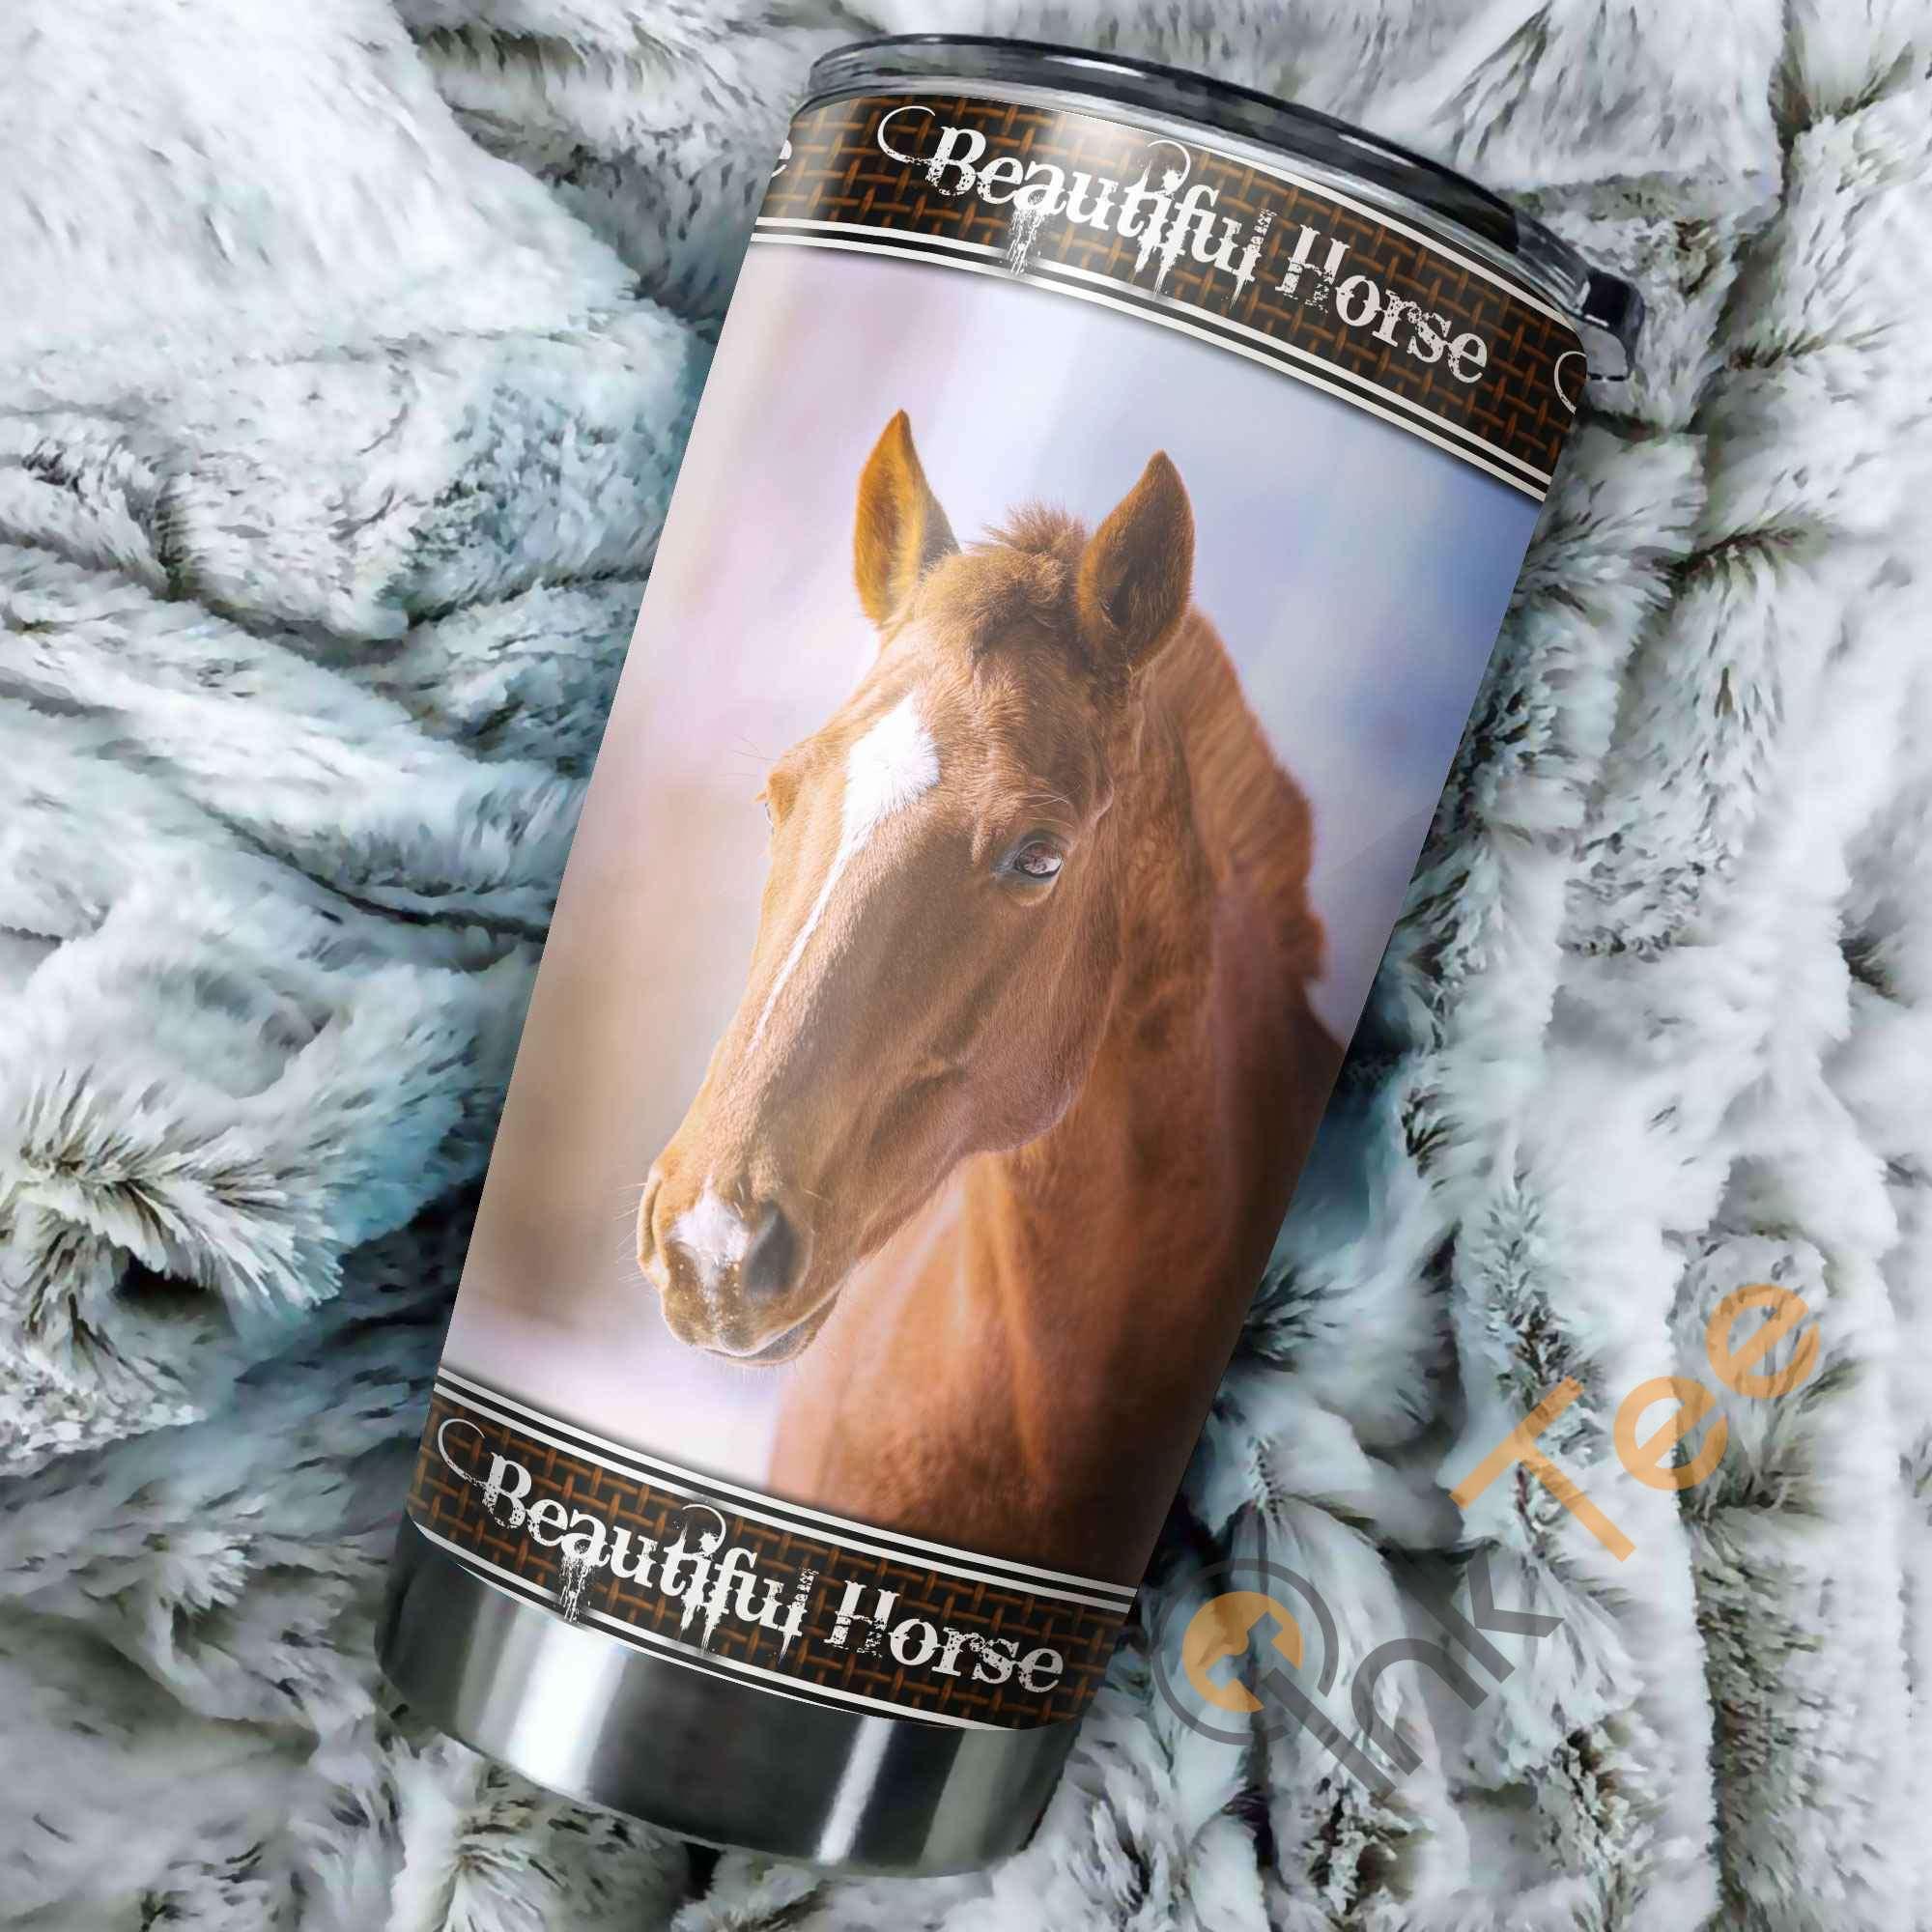 Beautiful Horse Amazon Best Seller Sku 3354 Stainless Steel Tumbler